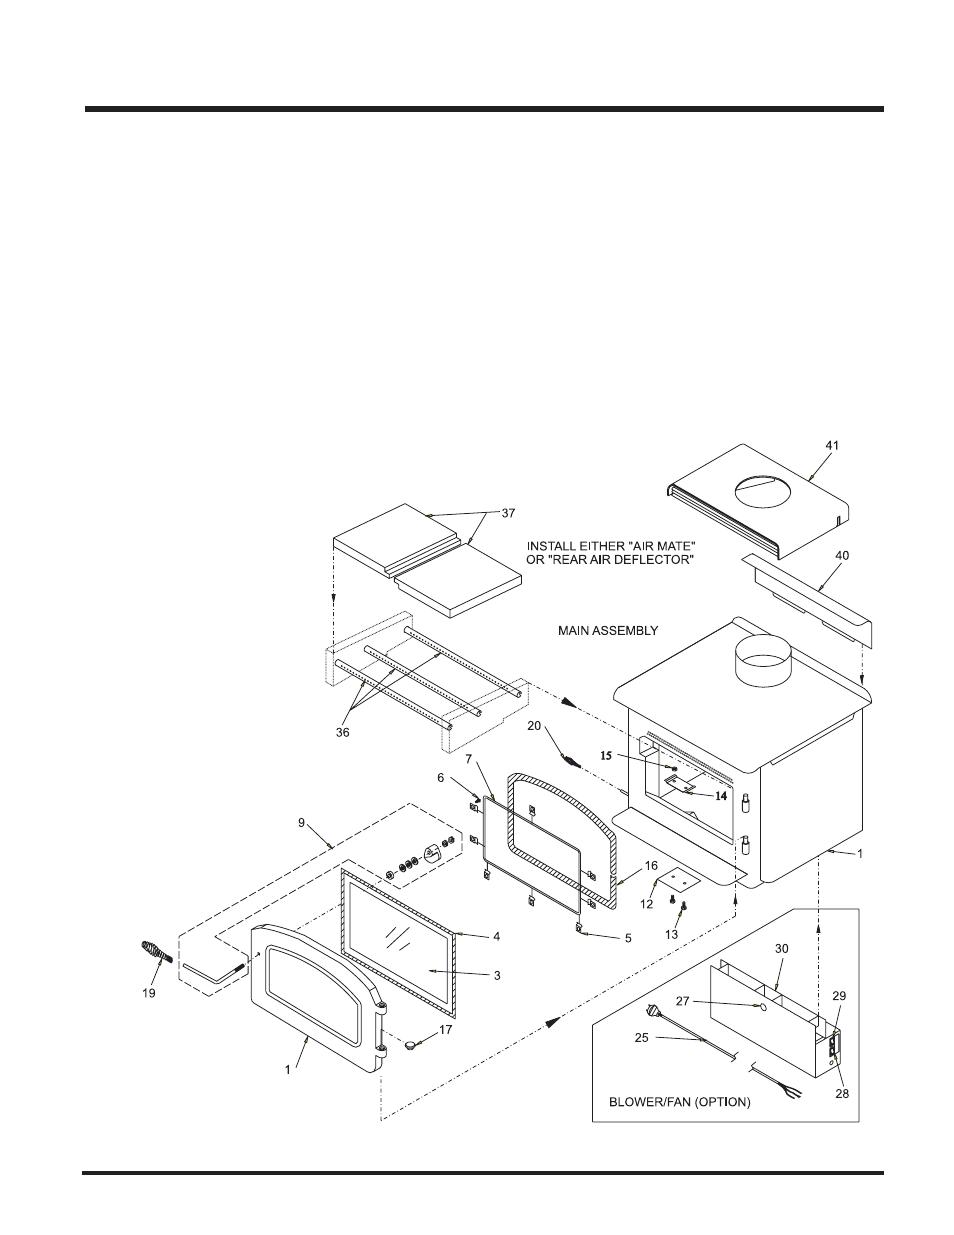 1978 mgb wiring diagram printable copy